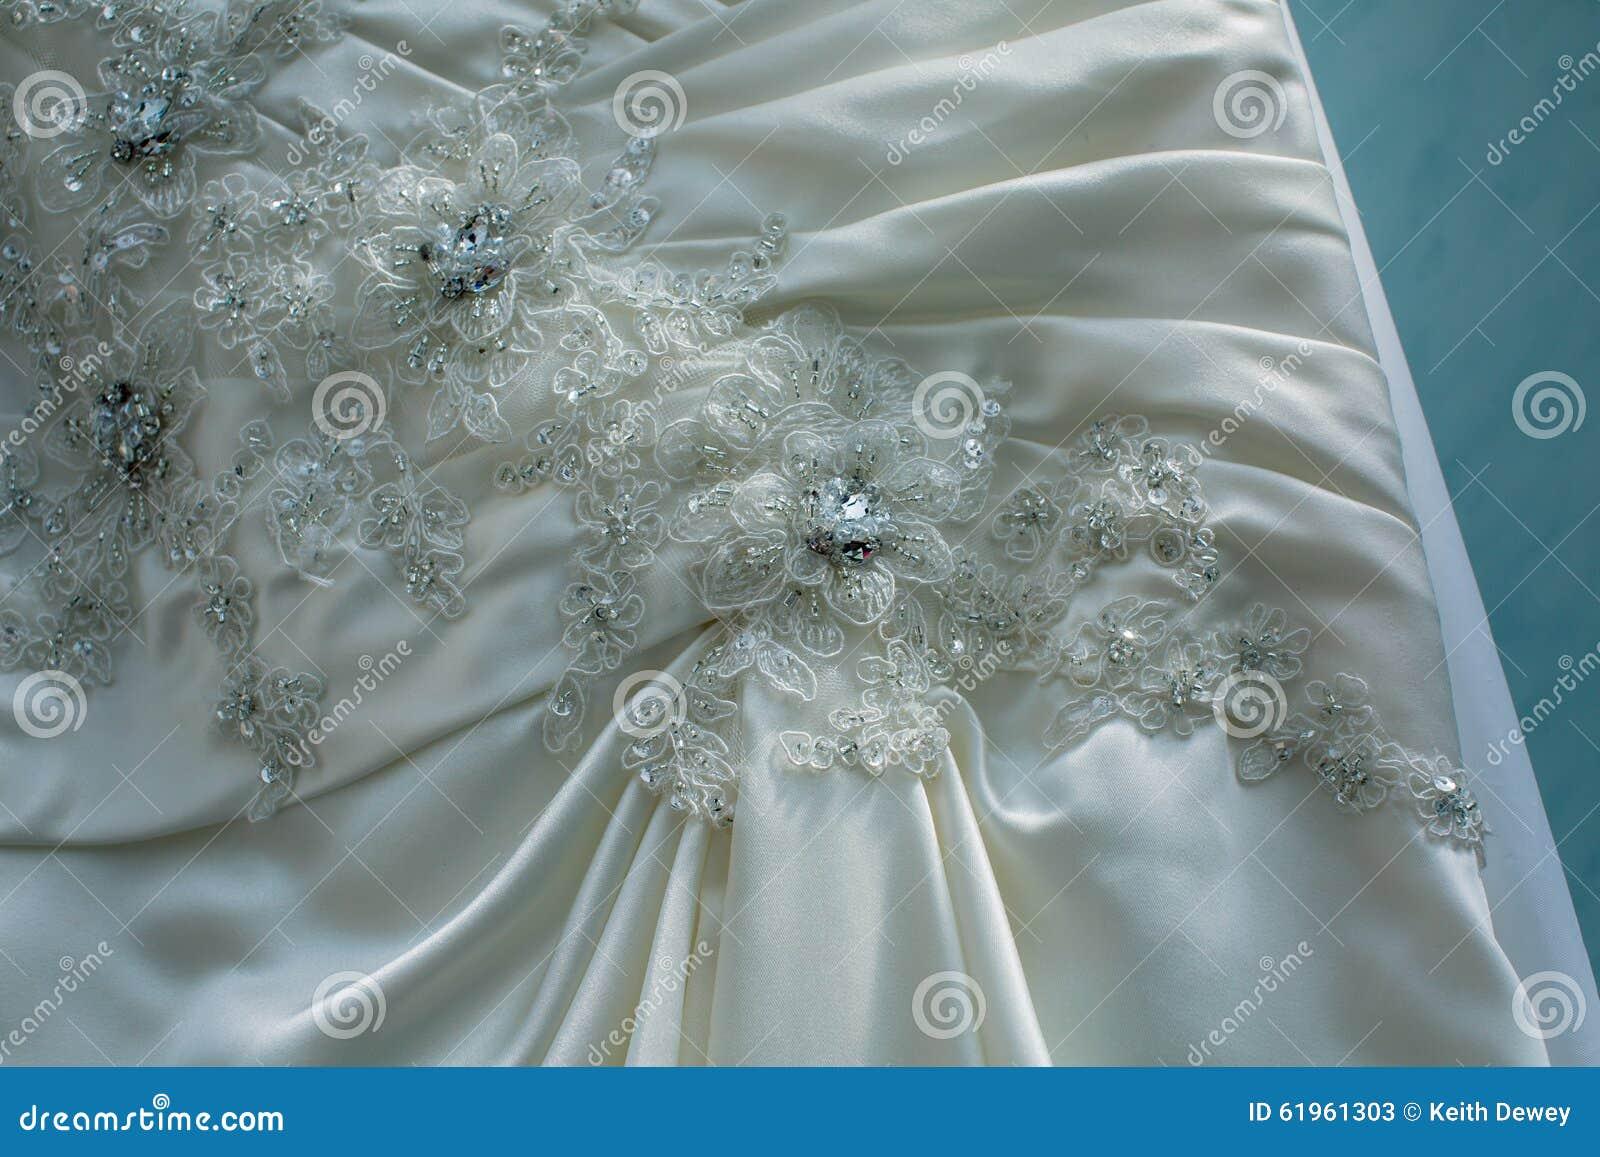 Macro Wedding Dress Pattern Stock Image - Image of skirt, bride ...